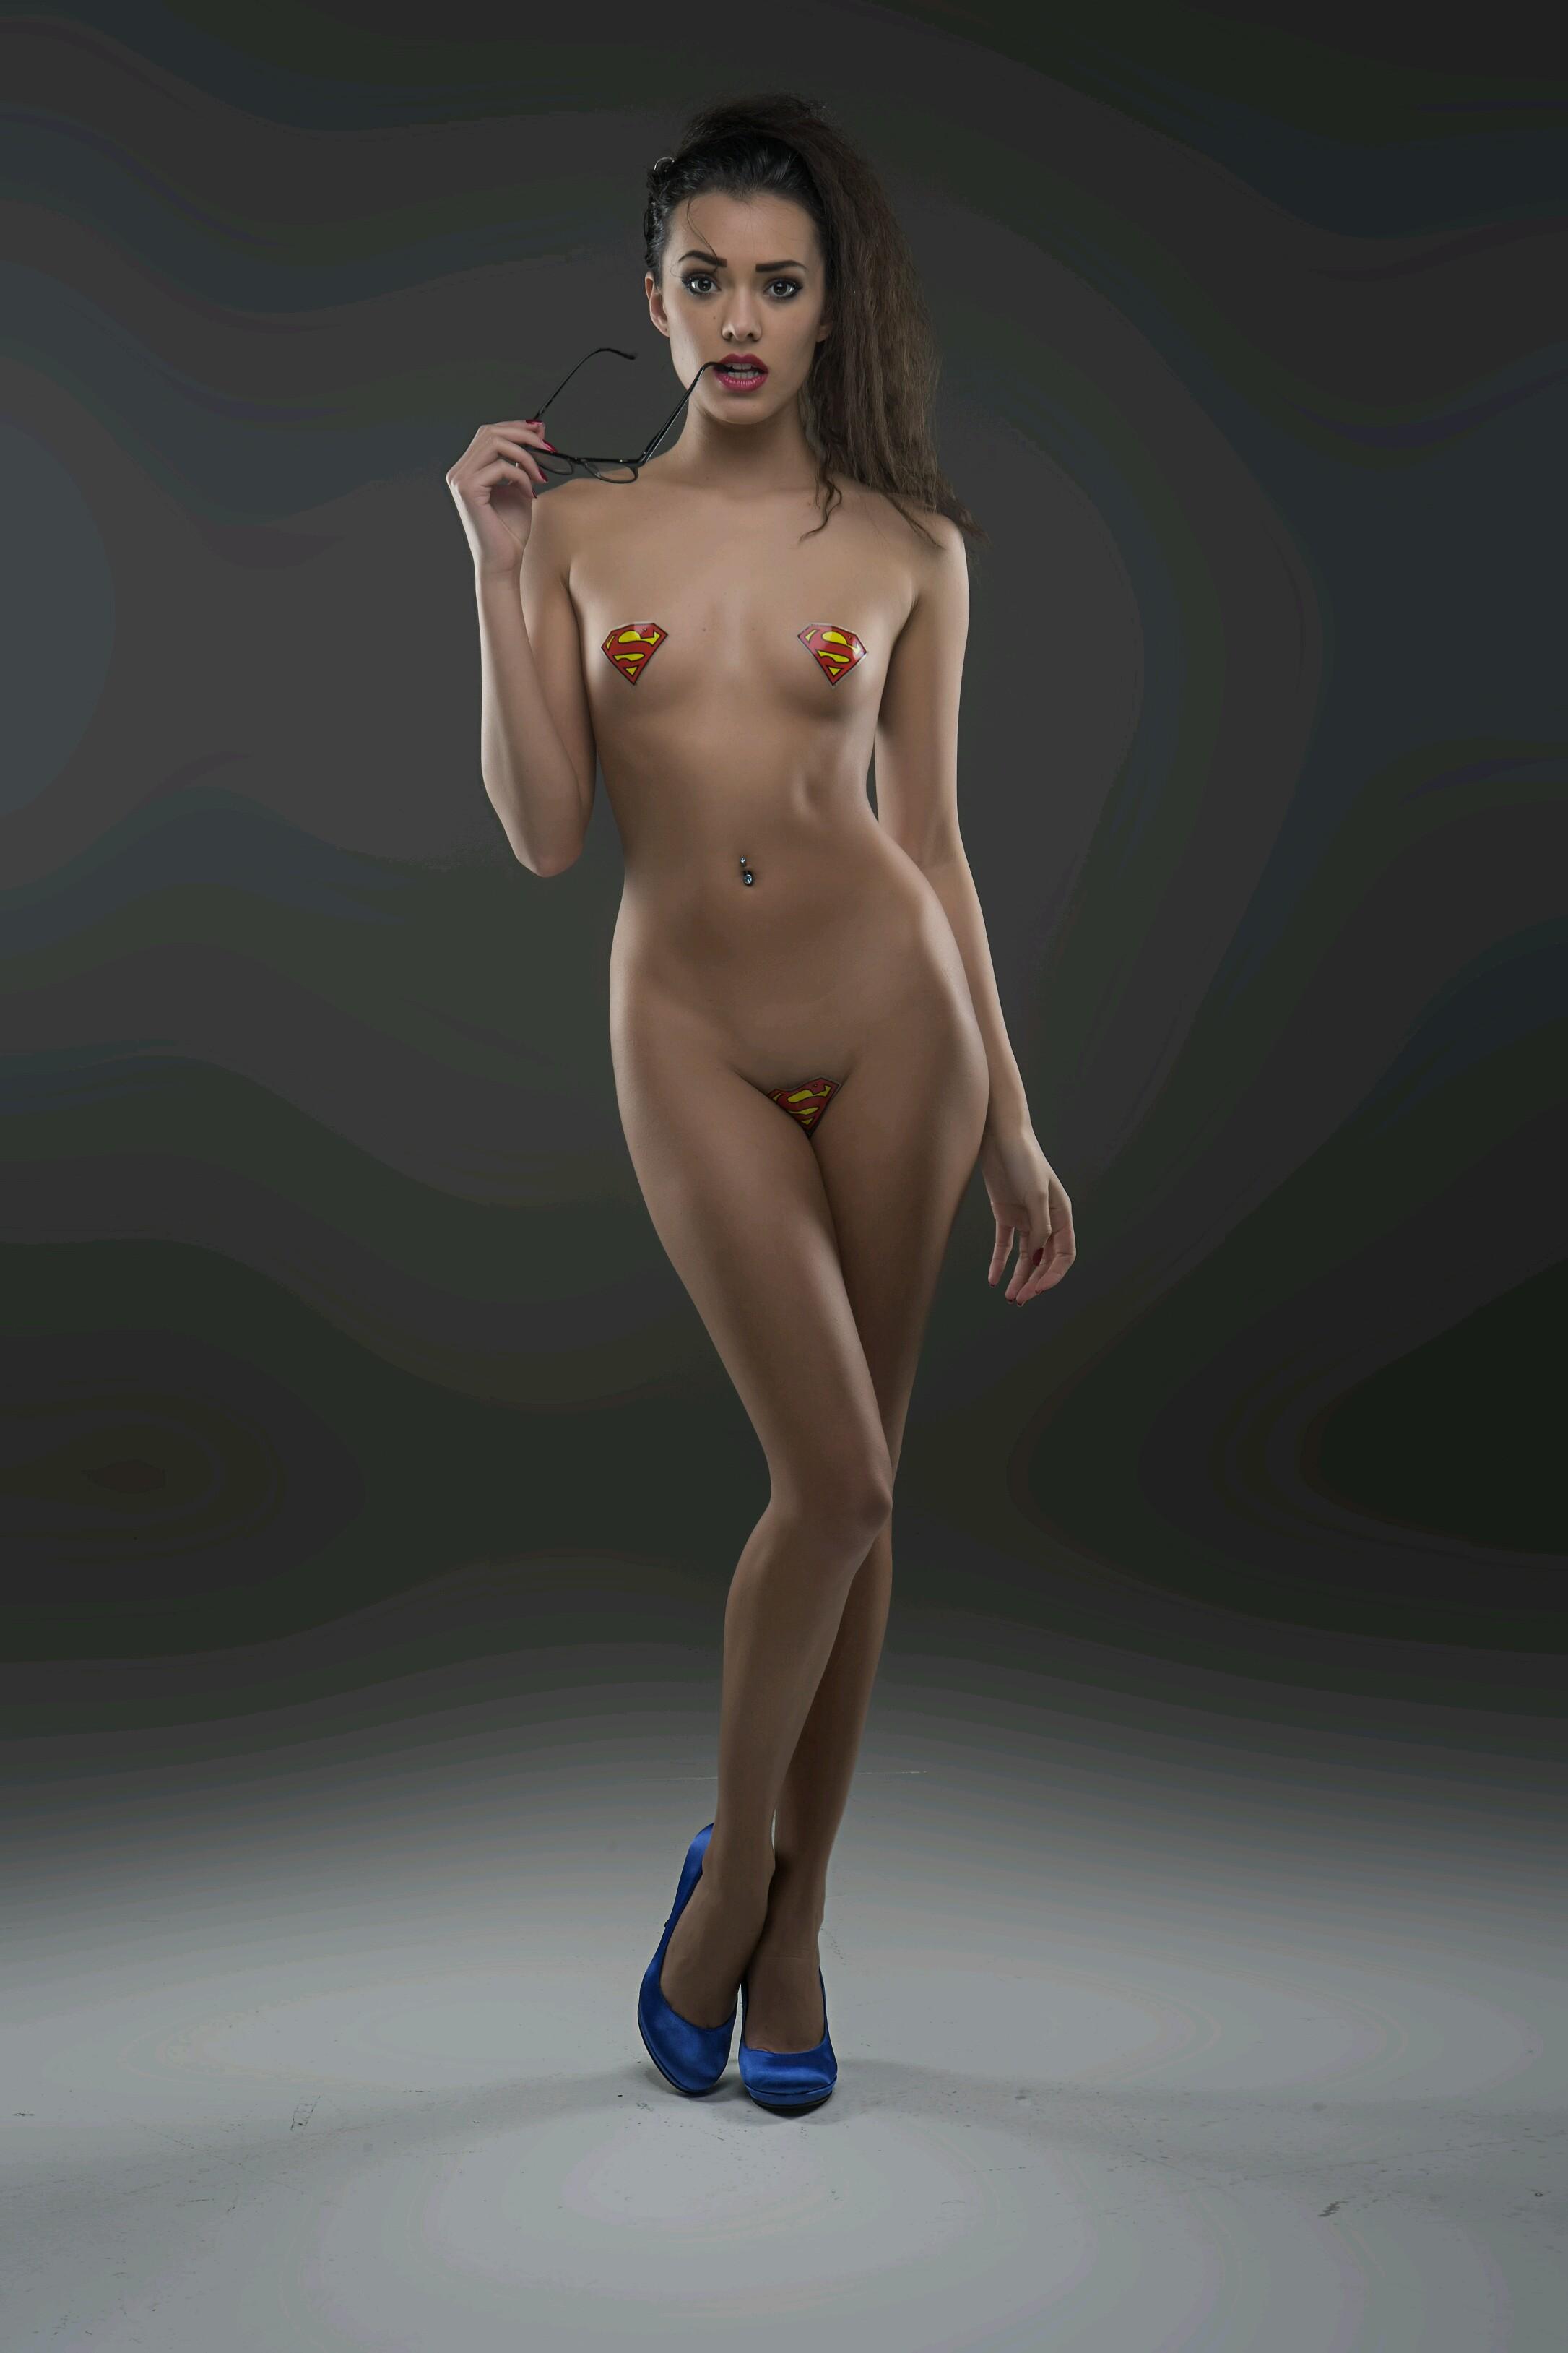 Joanie brosas naked